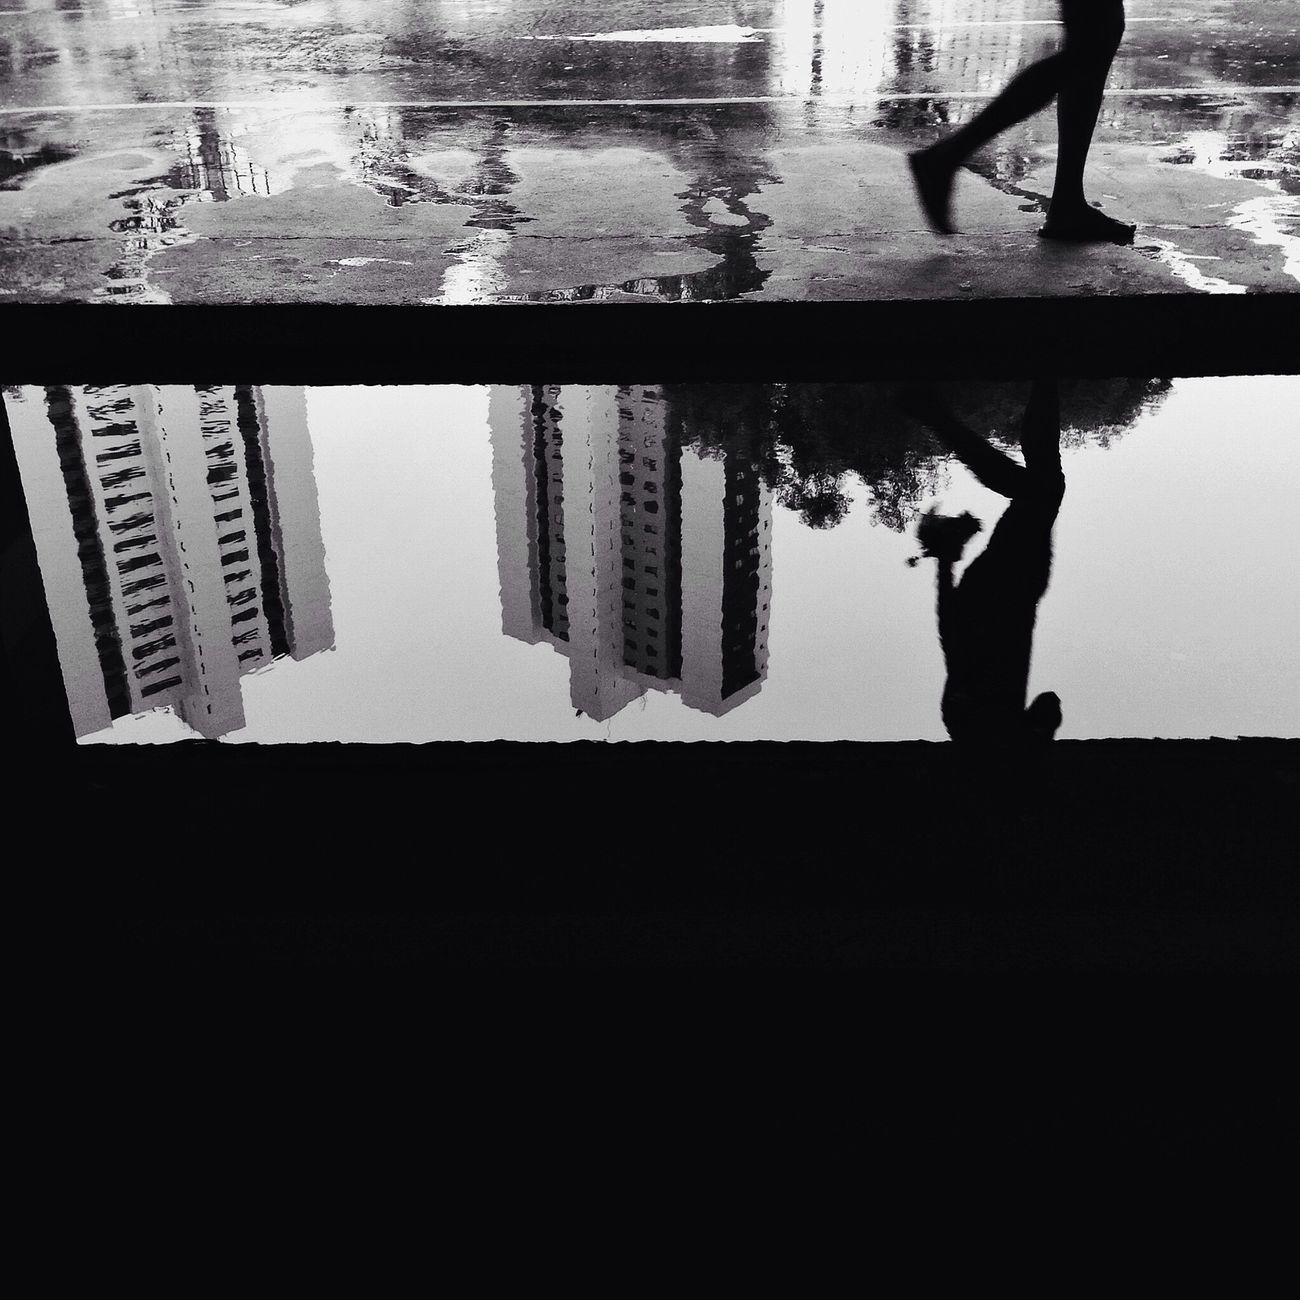 Streetphotography Urban Blackandwhite Streetphoto_bw